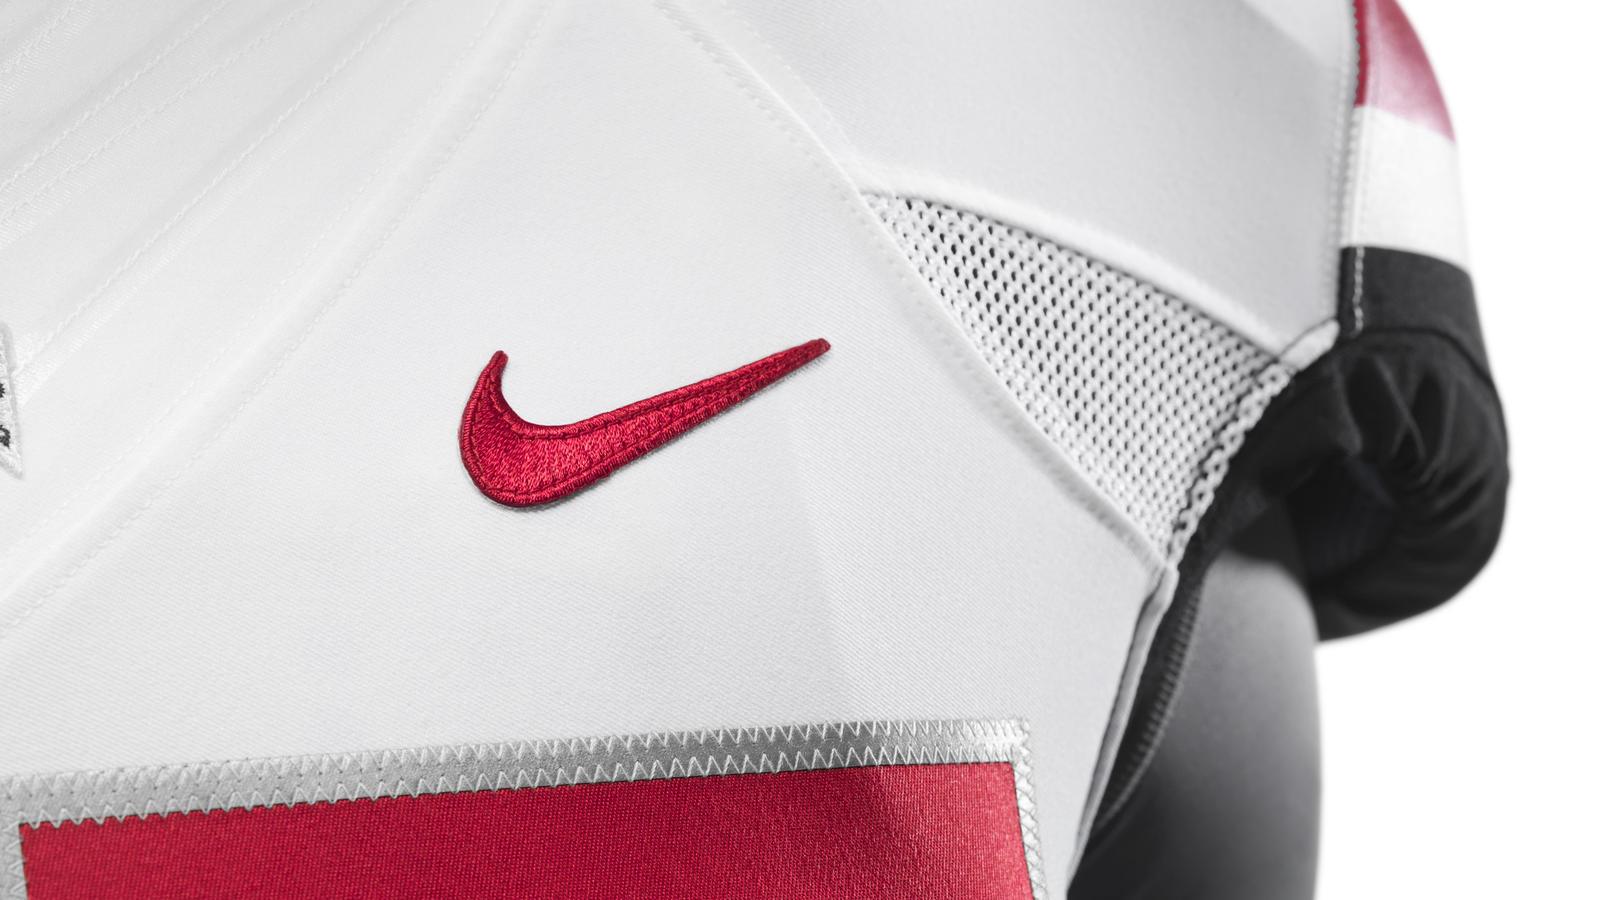 ncaa_fb13_uniforms_ohio_swoosh_top_0047